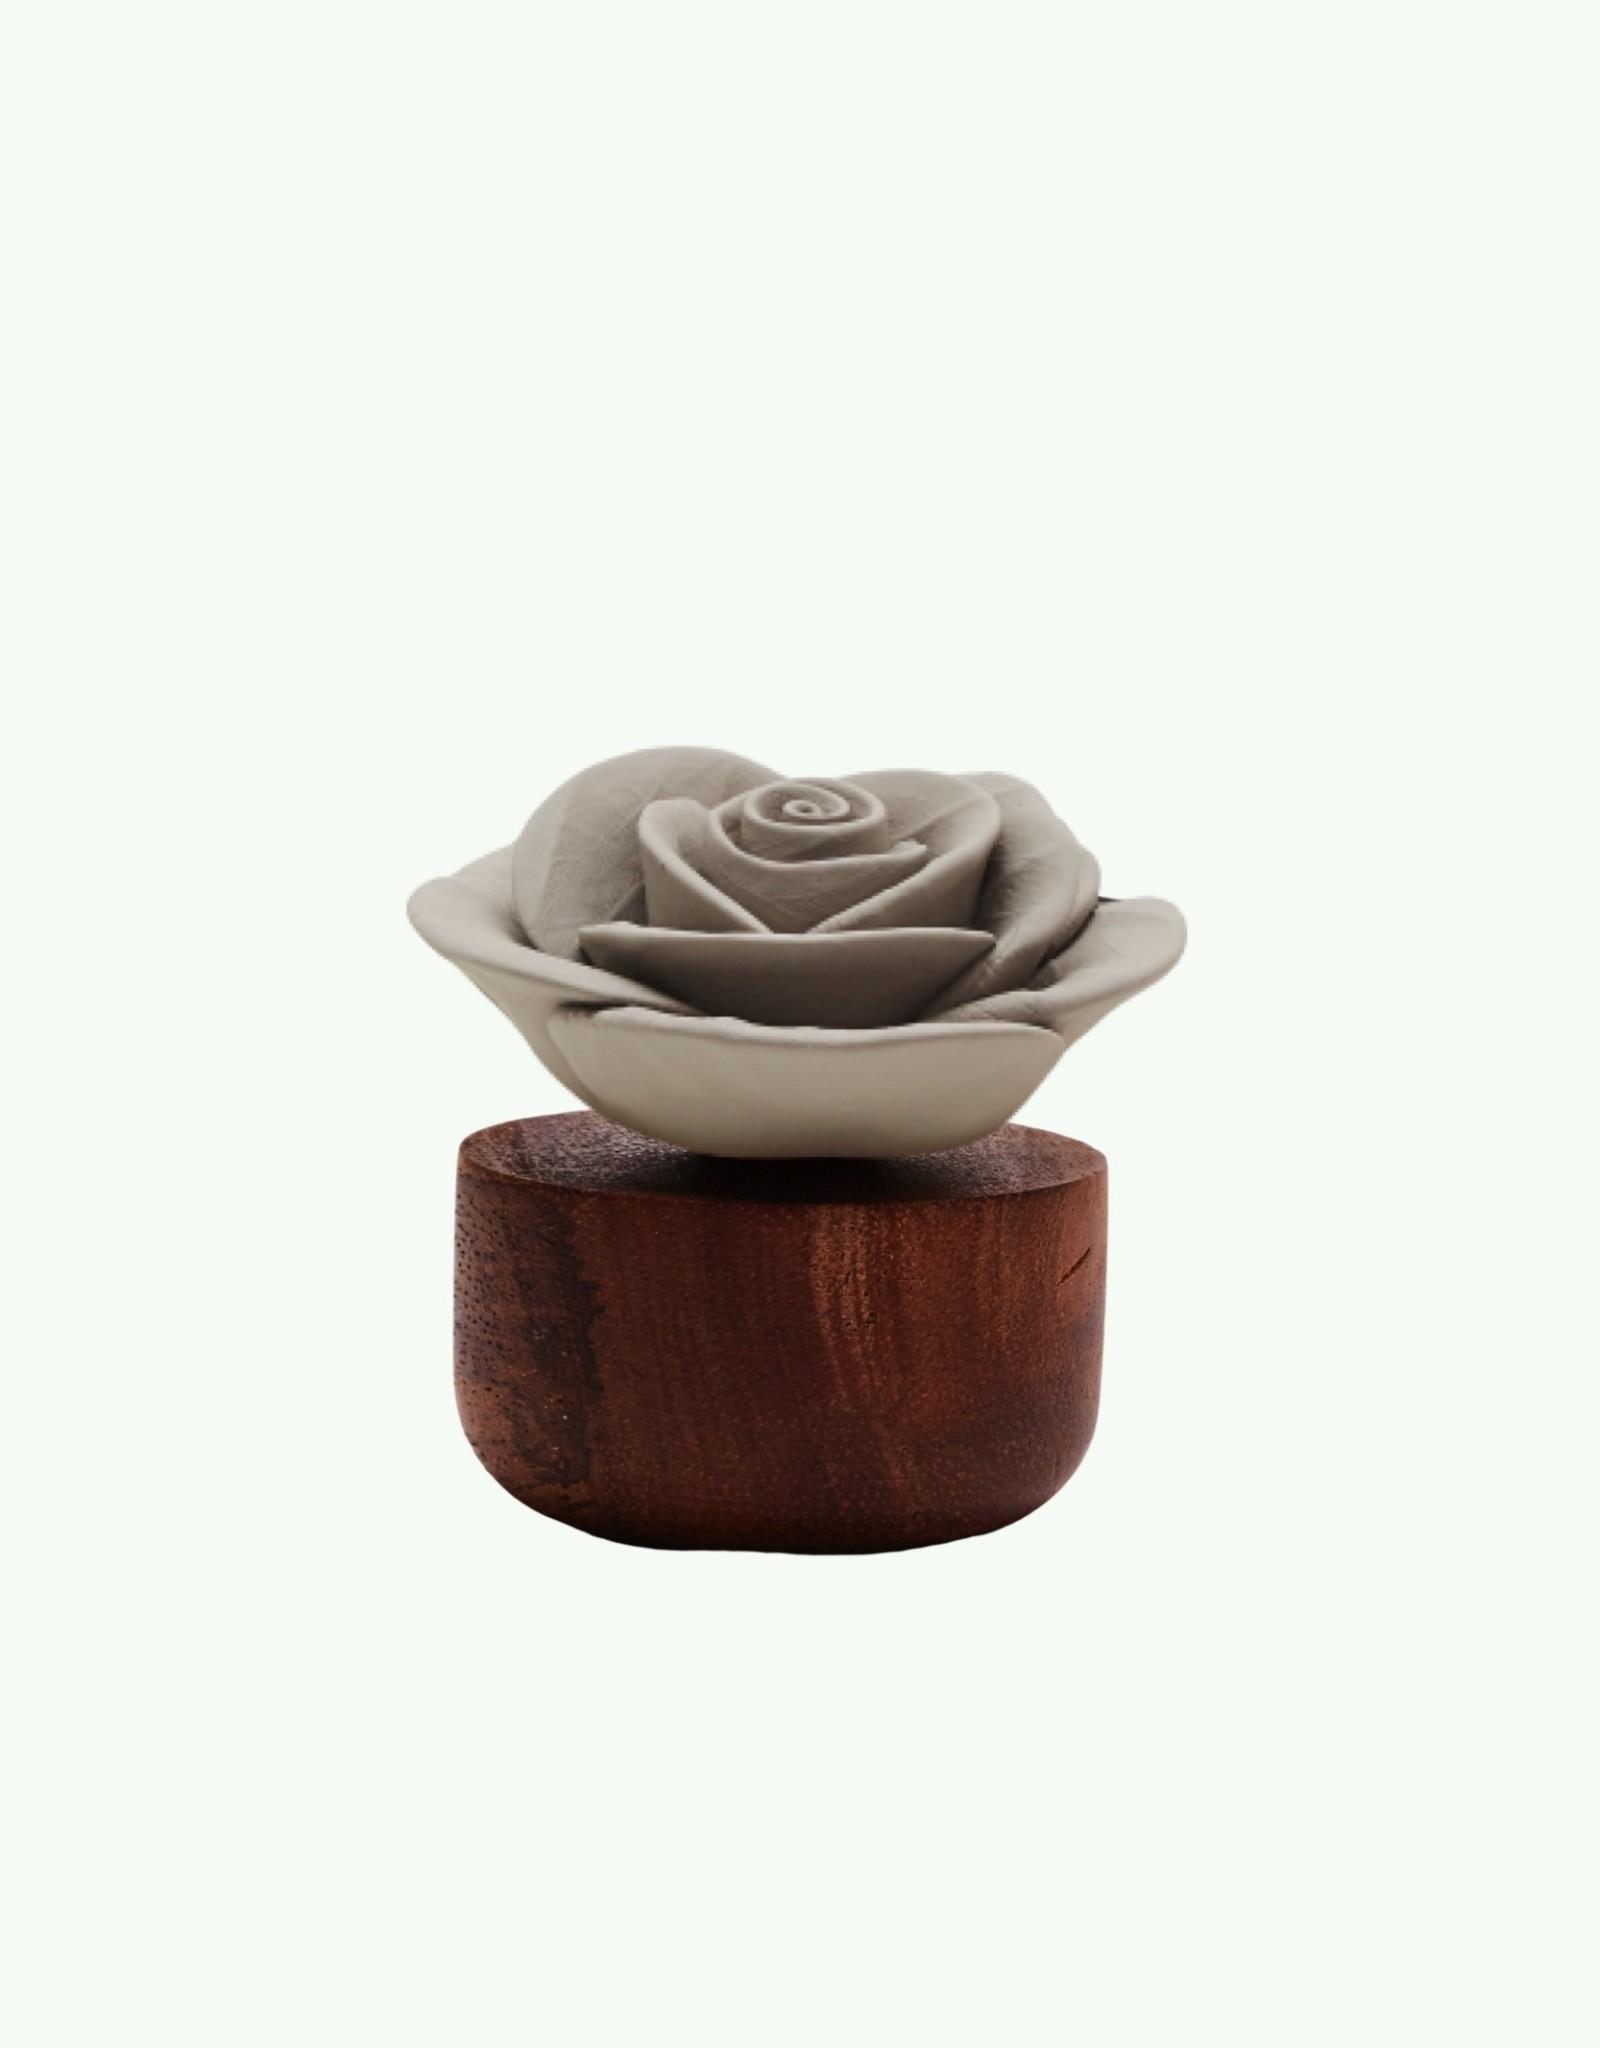 Anoq Anoq - Gardenia du Laos - Parfum Diffuser - 2 kleuren